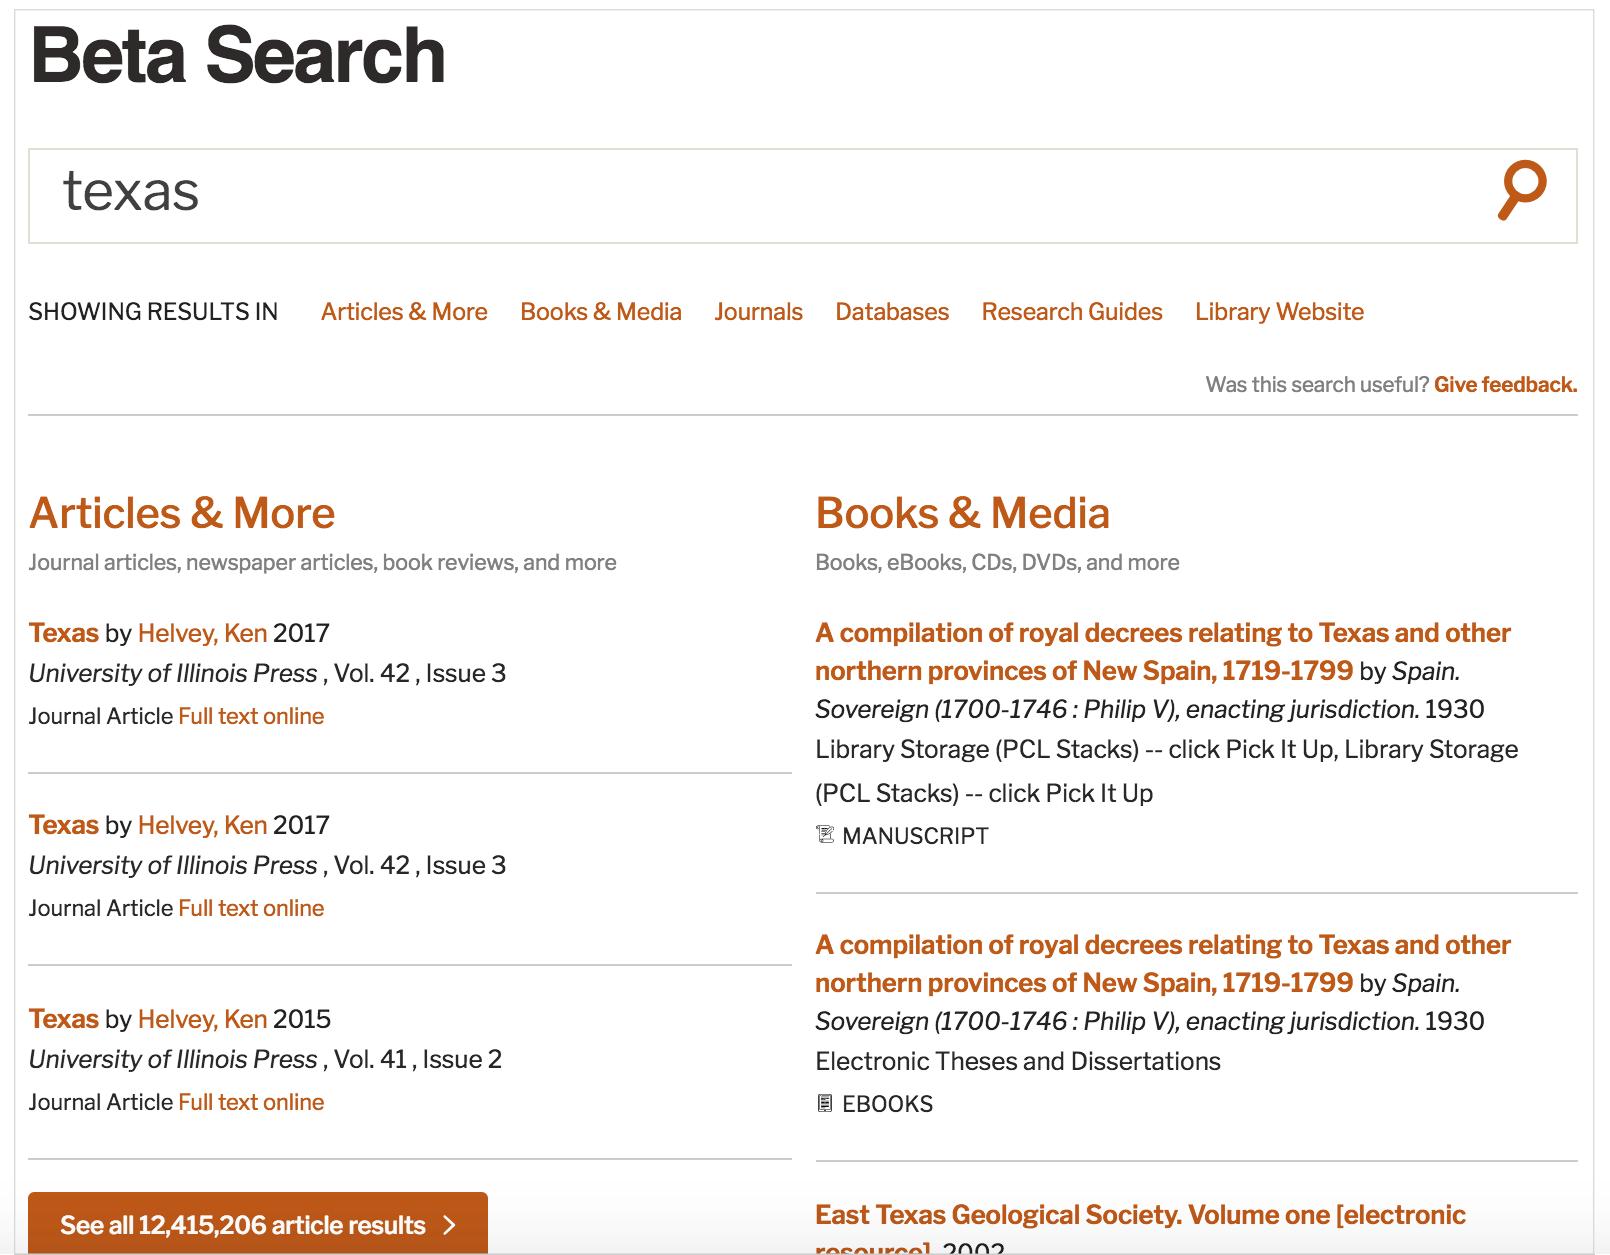 beta search results